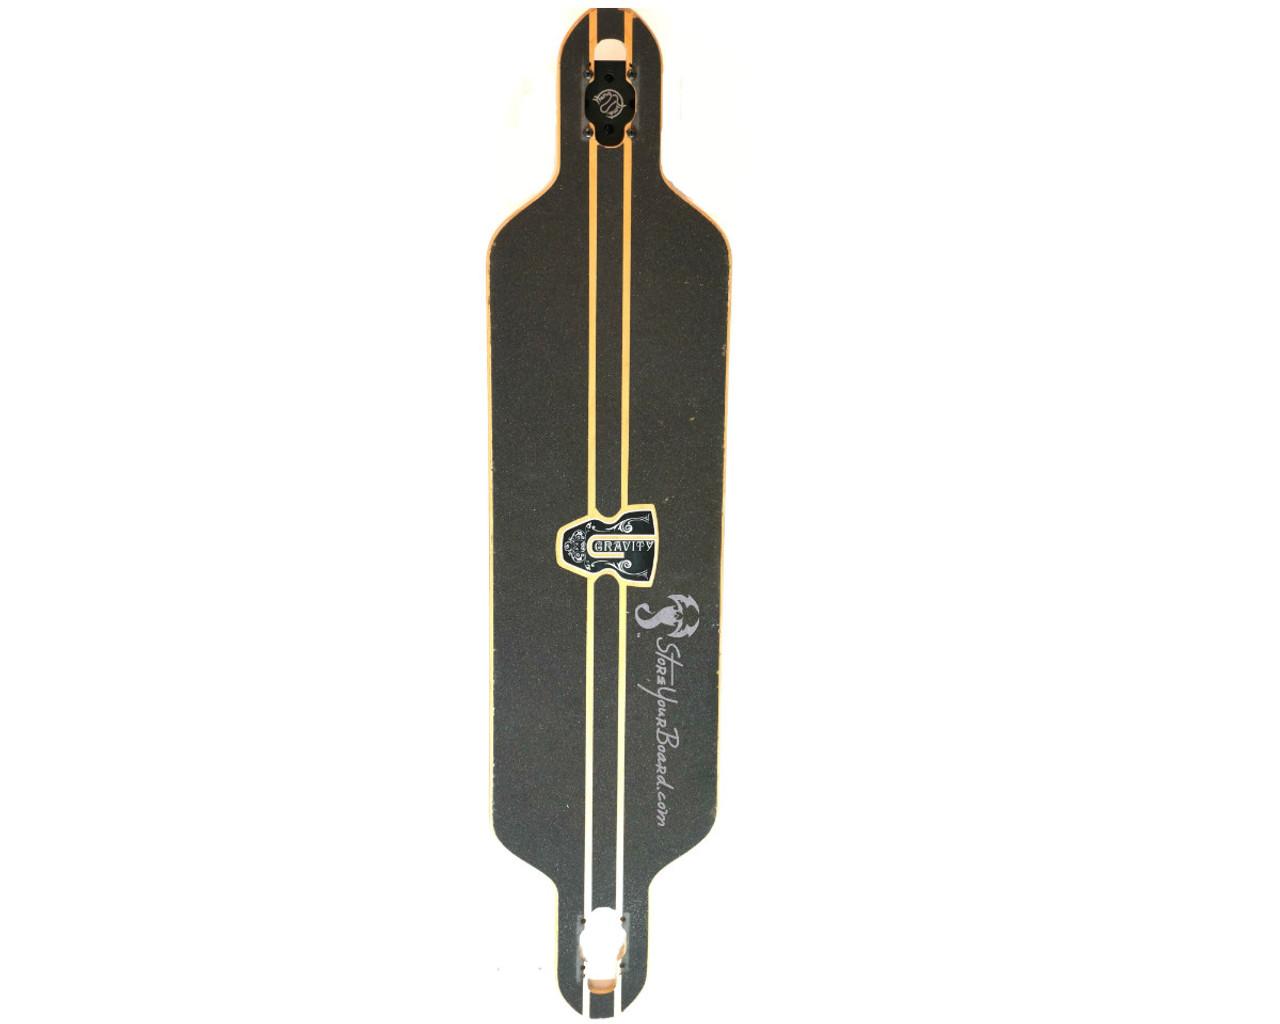 longboard display rack